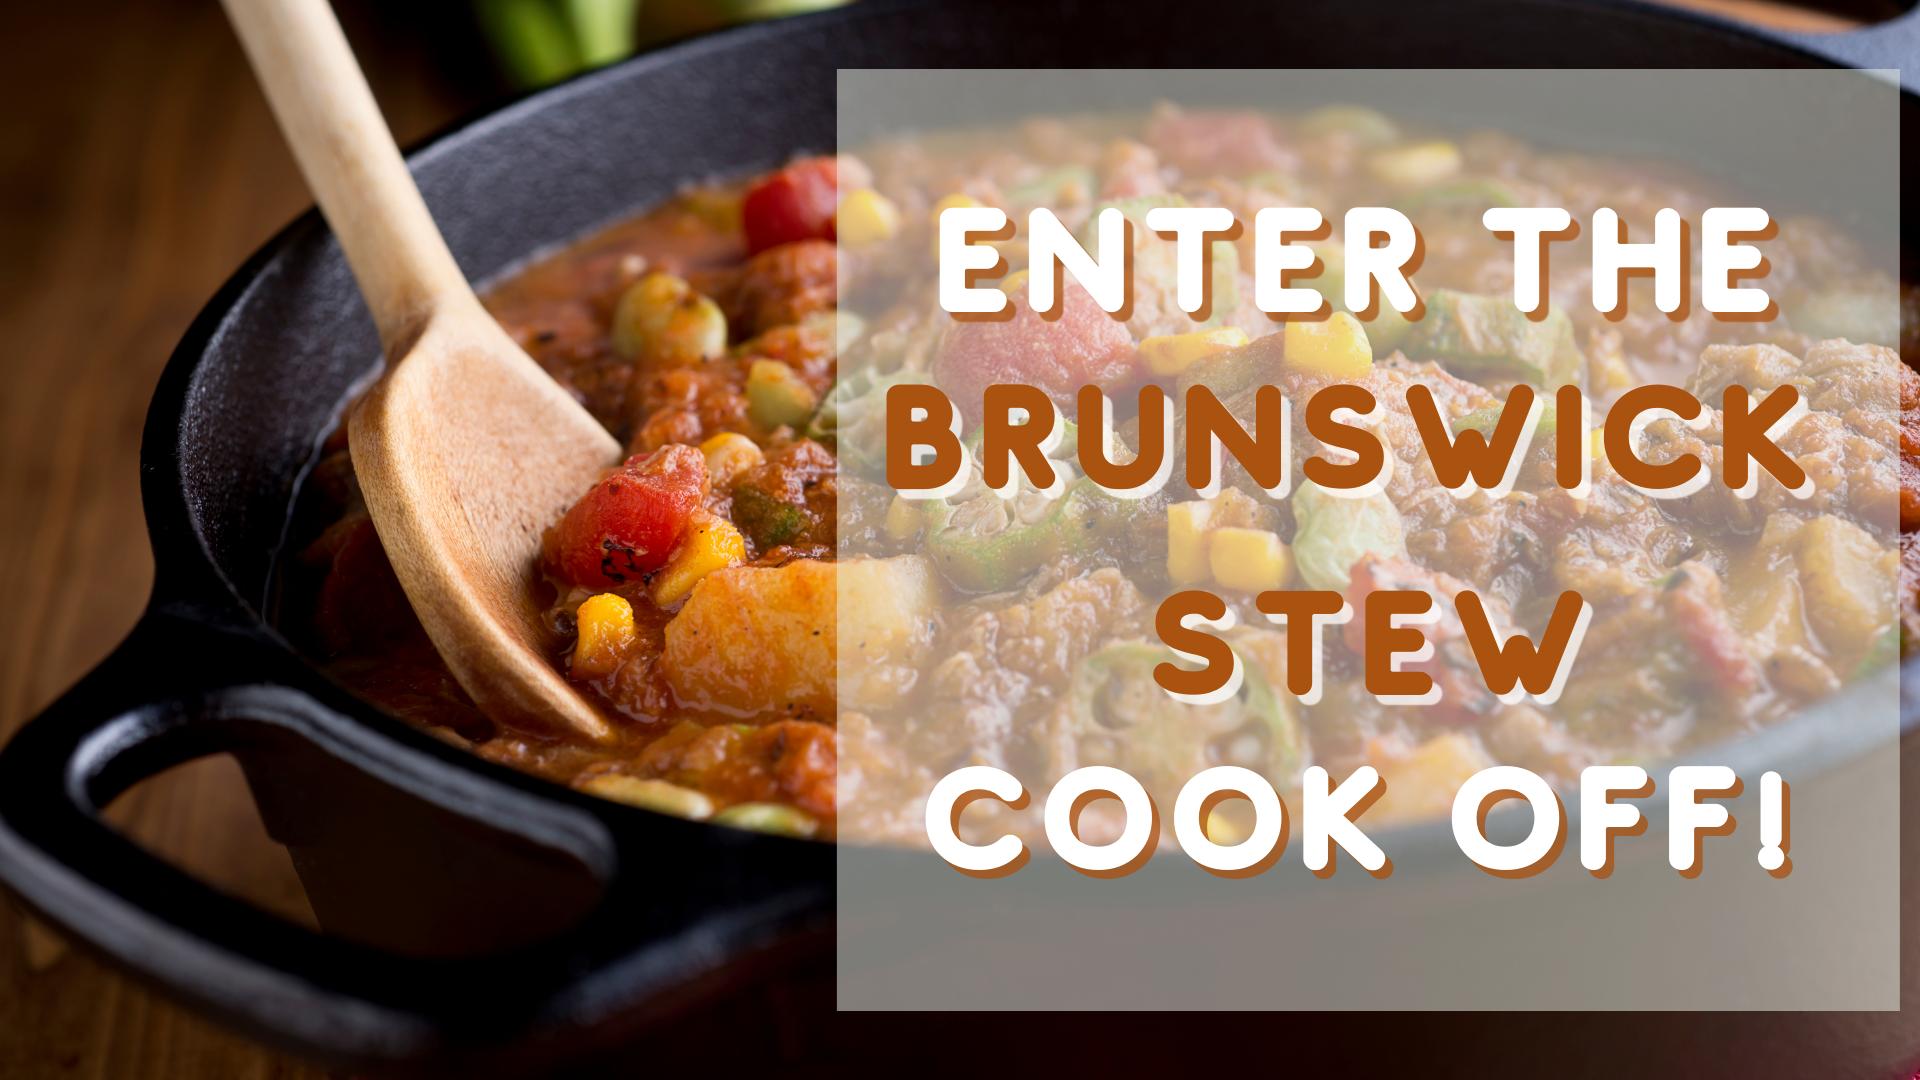 Brunswick Stew Cook off